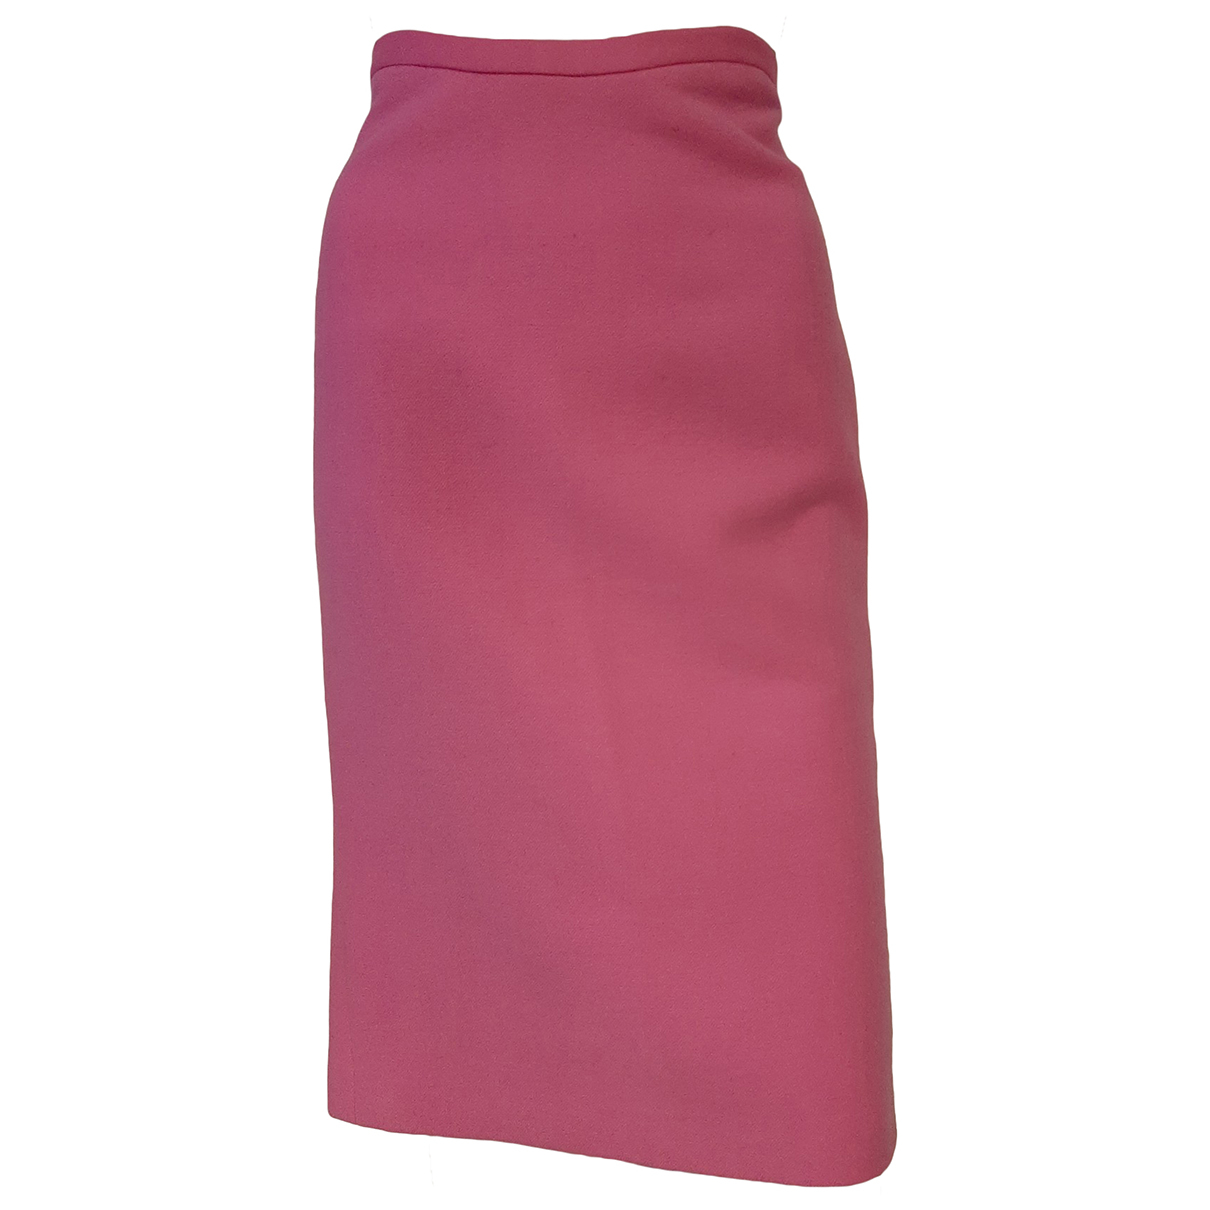 Gianni Versace \N Pink Wool skirt for Women 42 FR